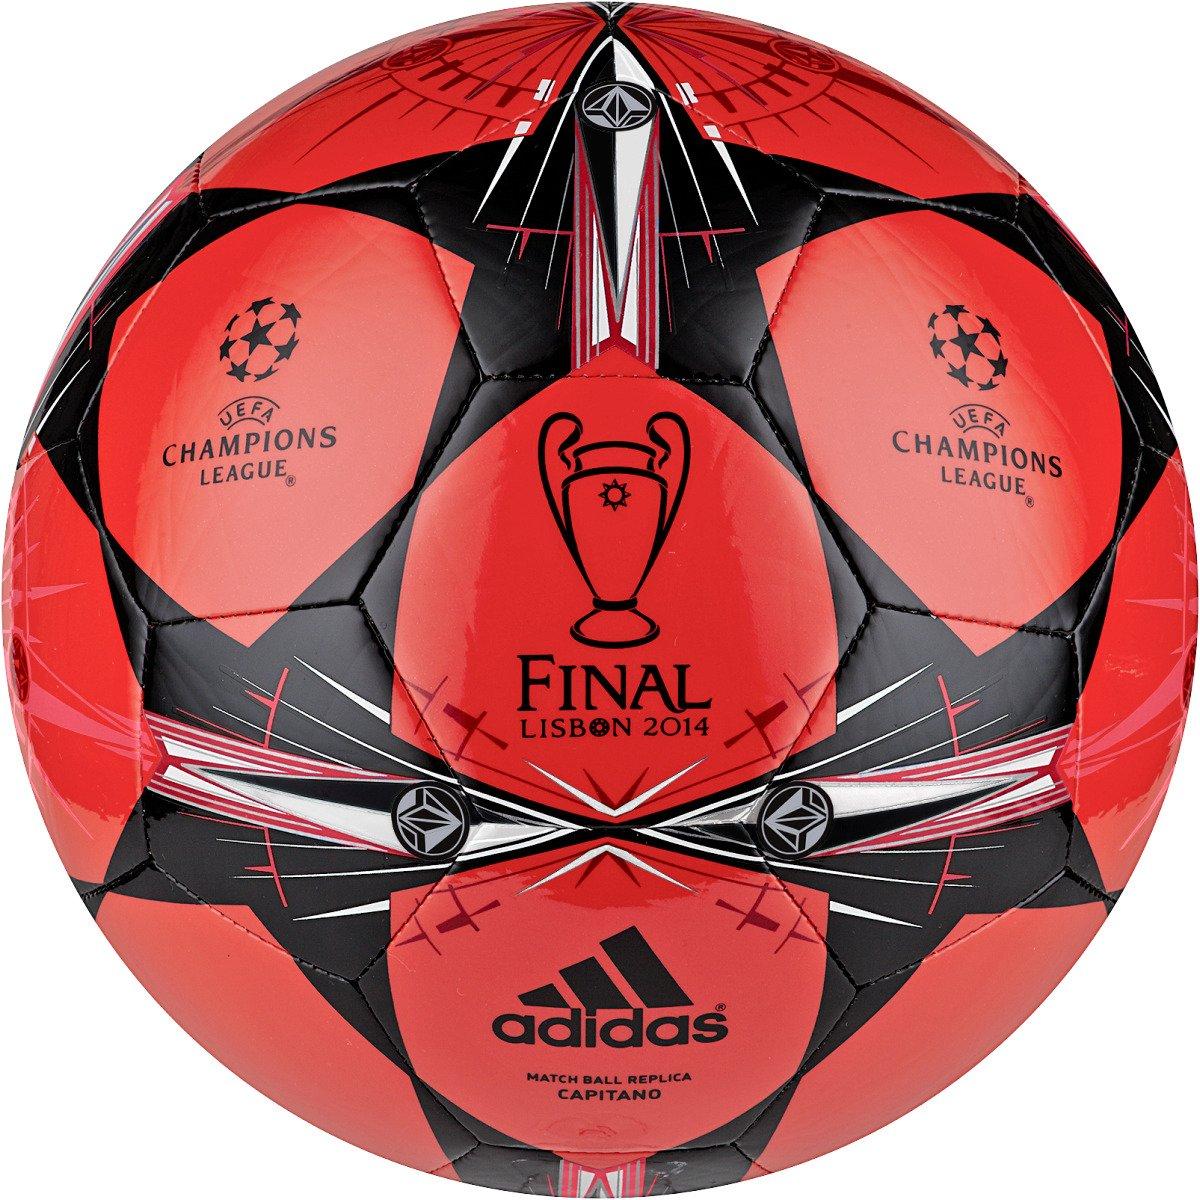 adidas Finale Lisbon Capitano Soccer Ball